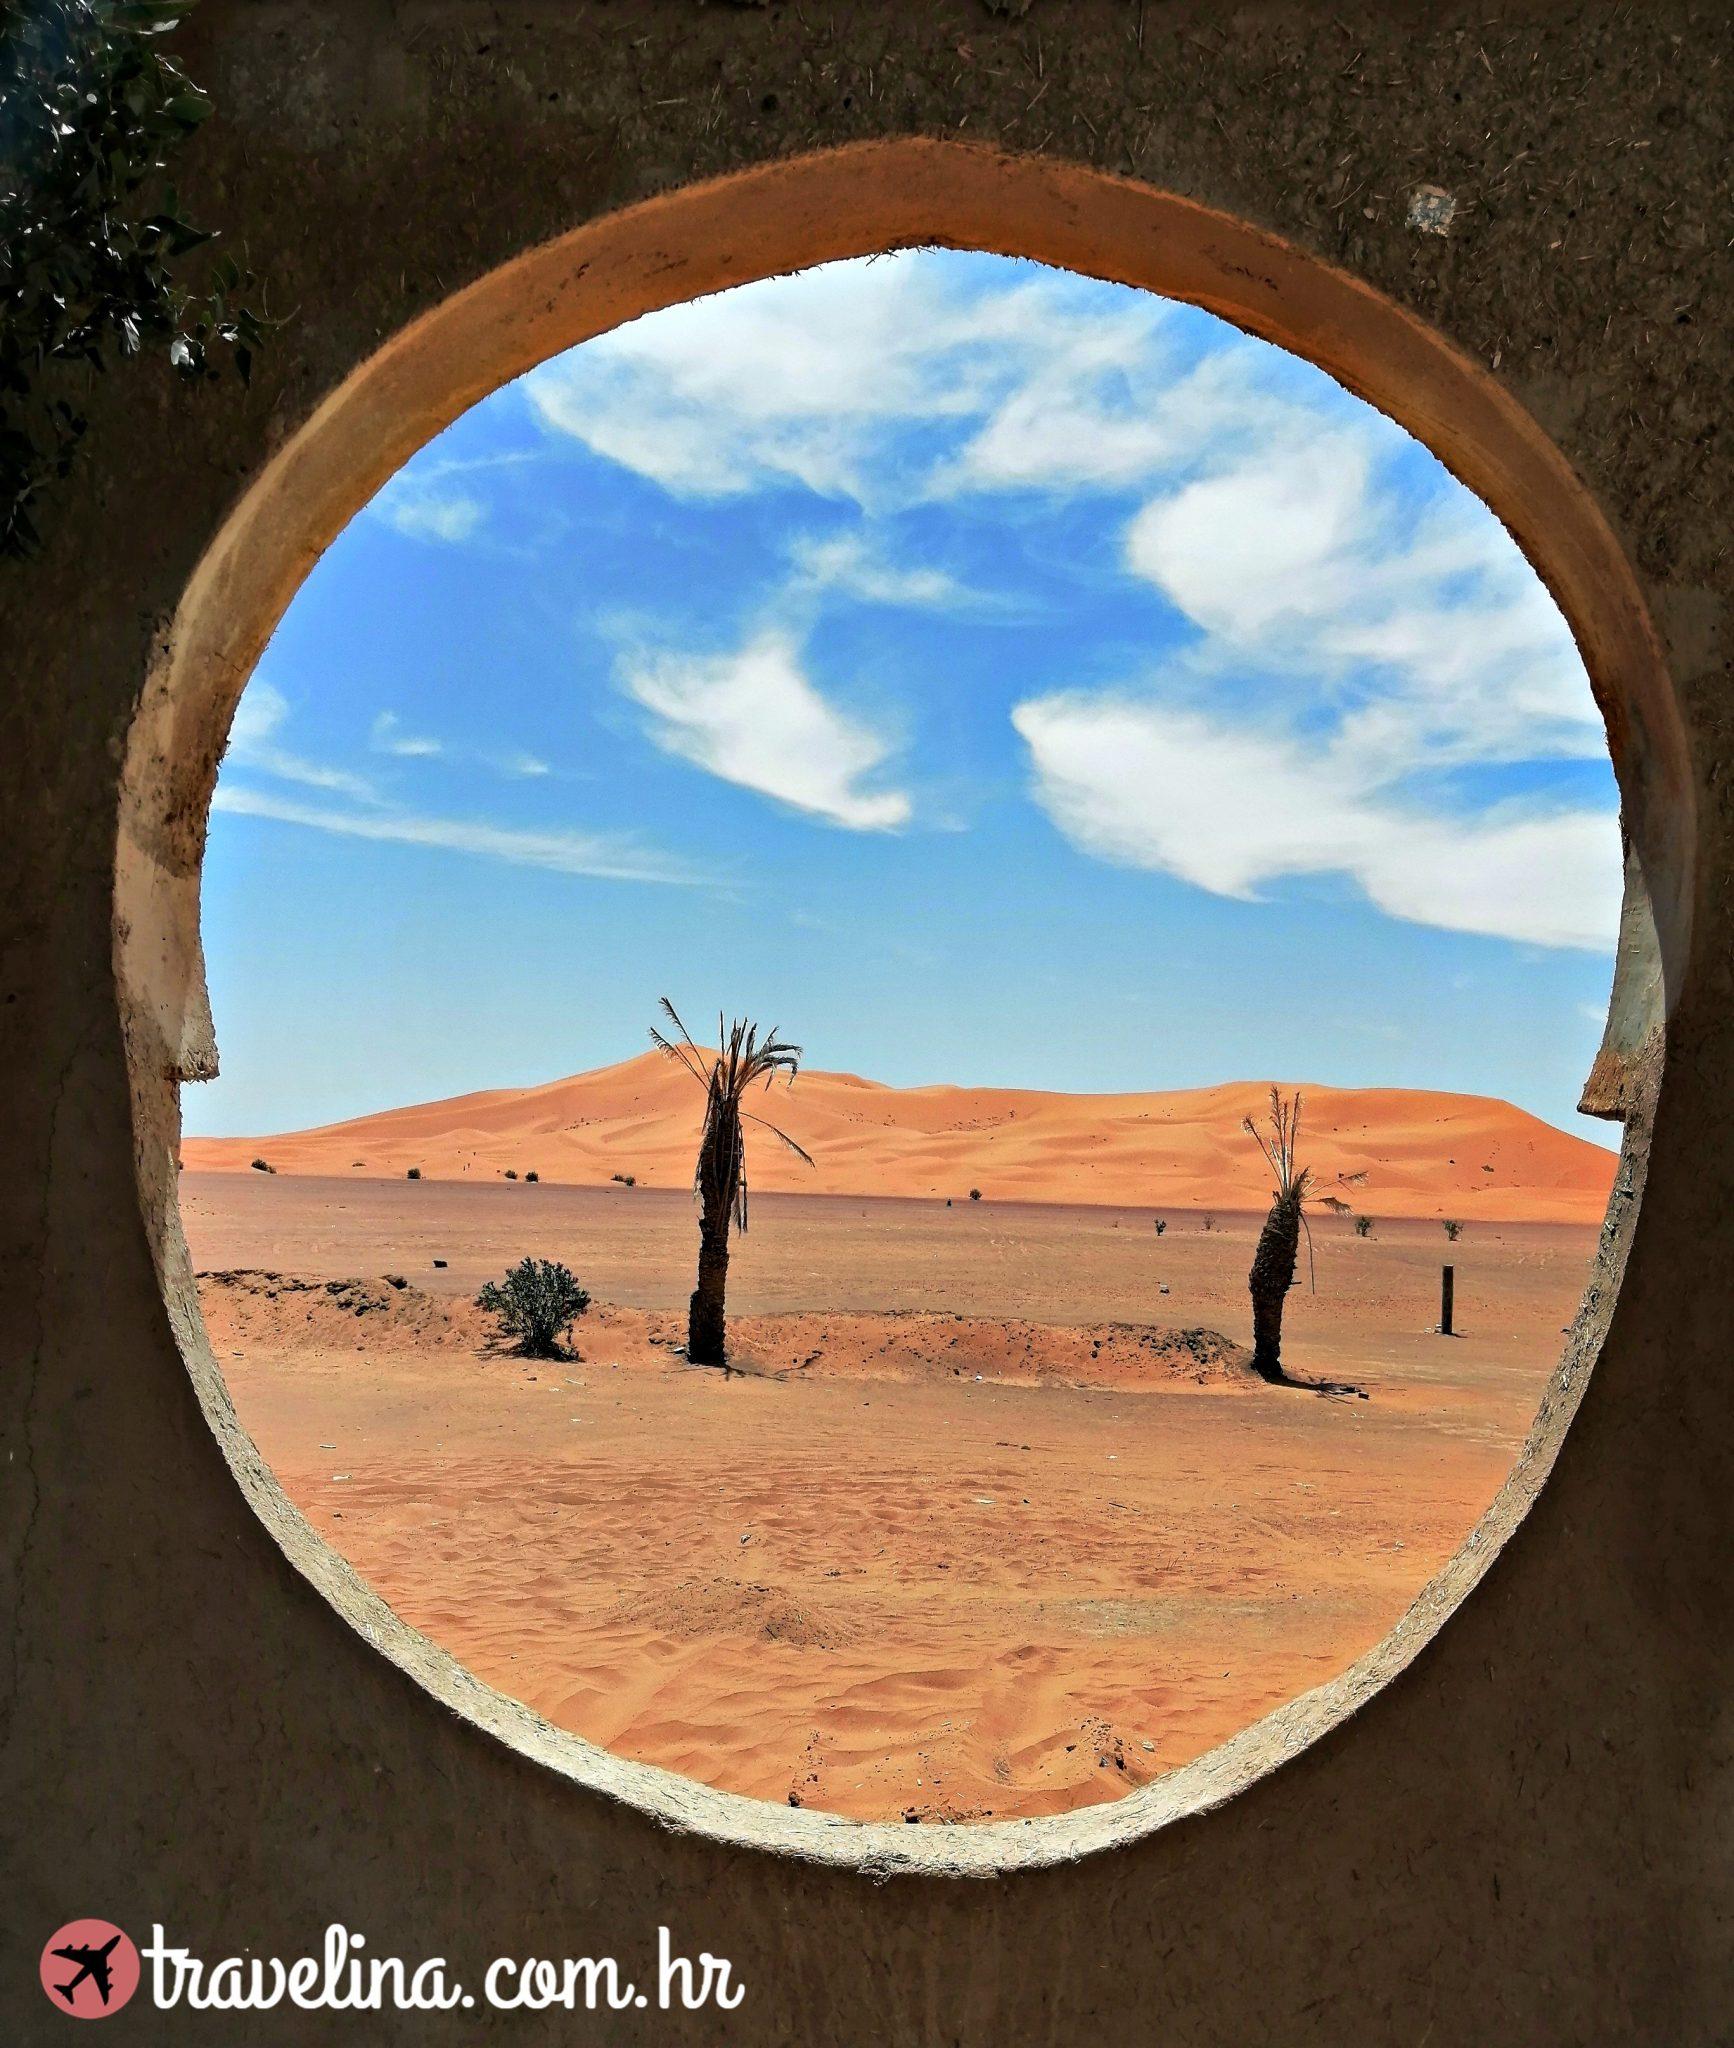 Hotel u Pustinji, Merzouga, Sahara